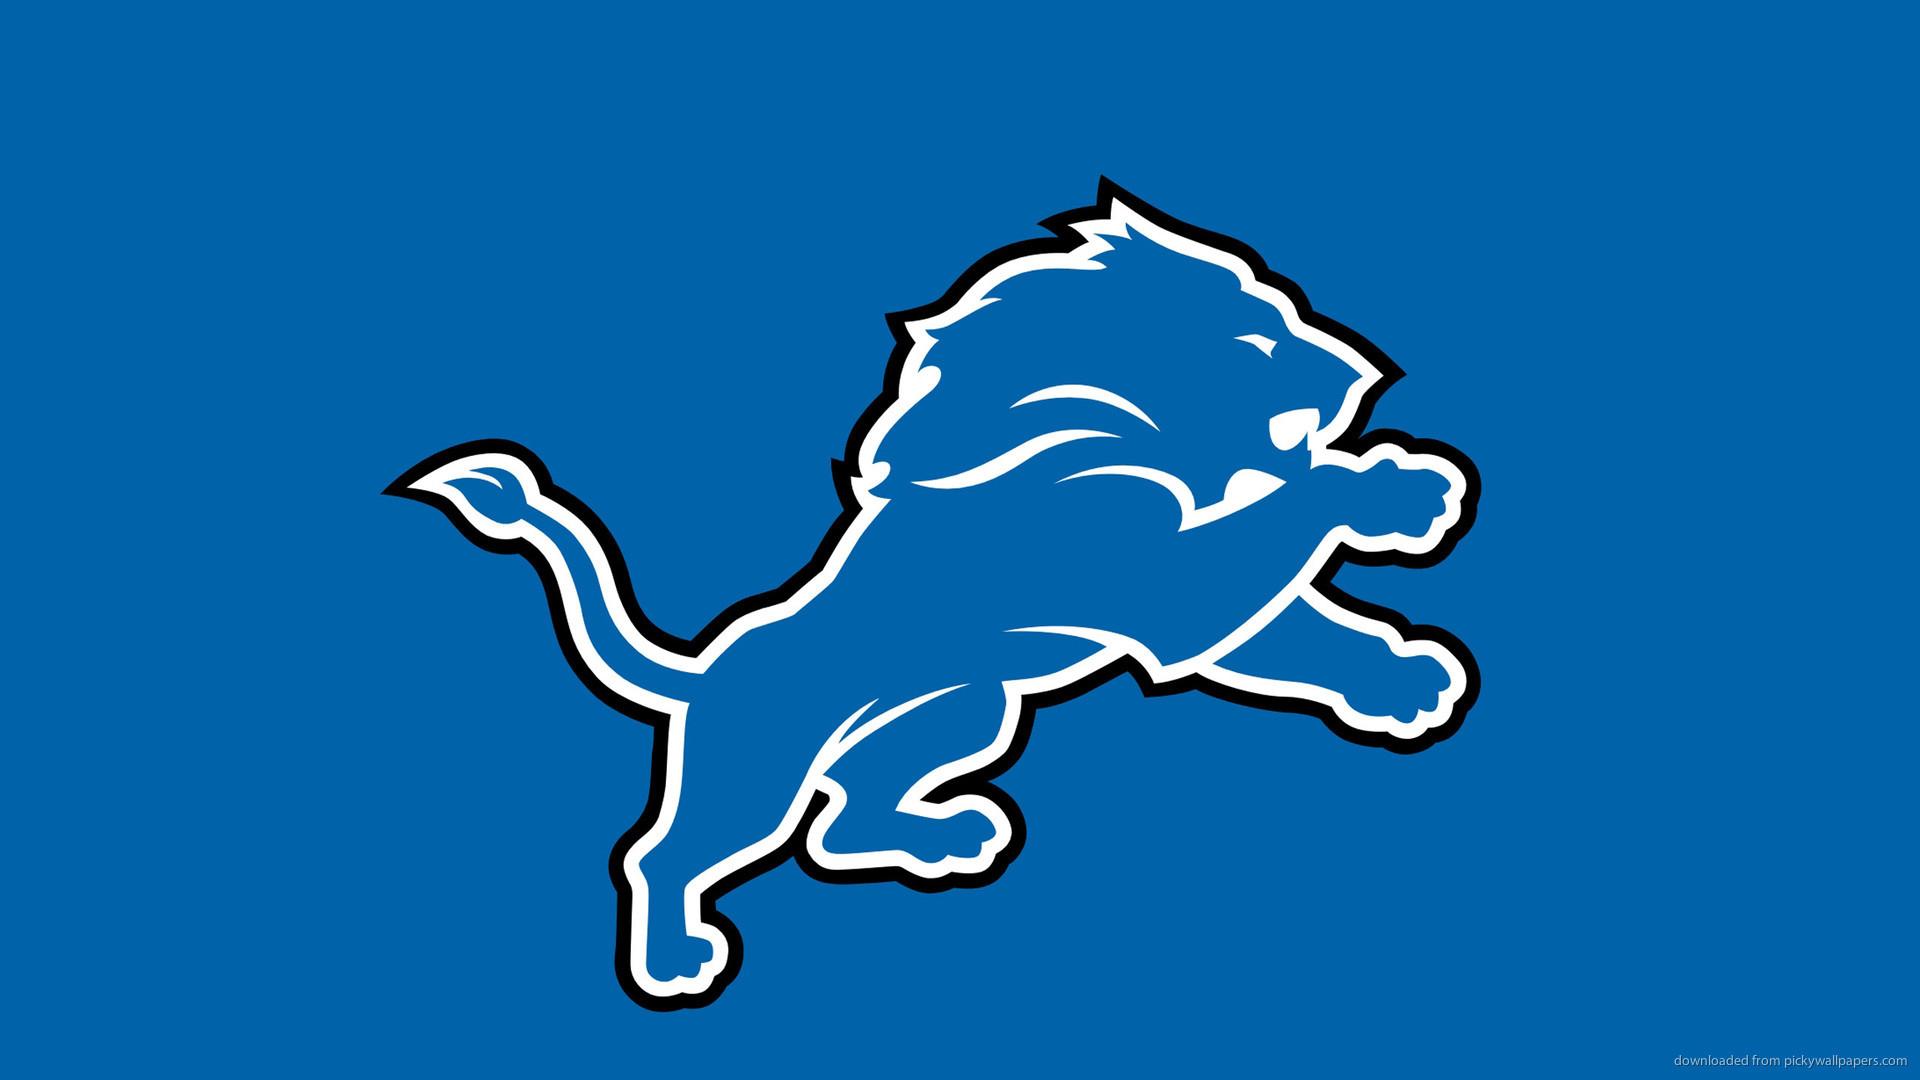 Detroit Lions Logo On A Blue Background picture